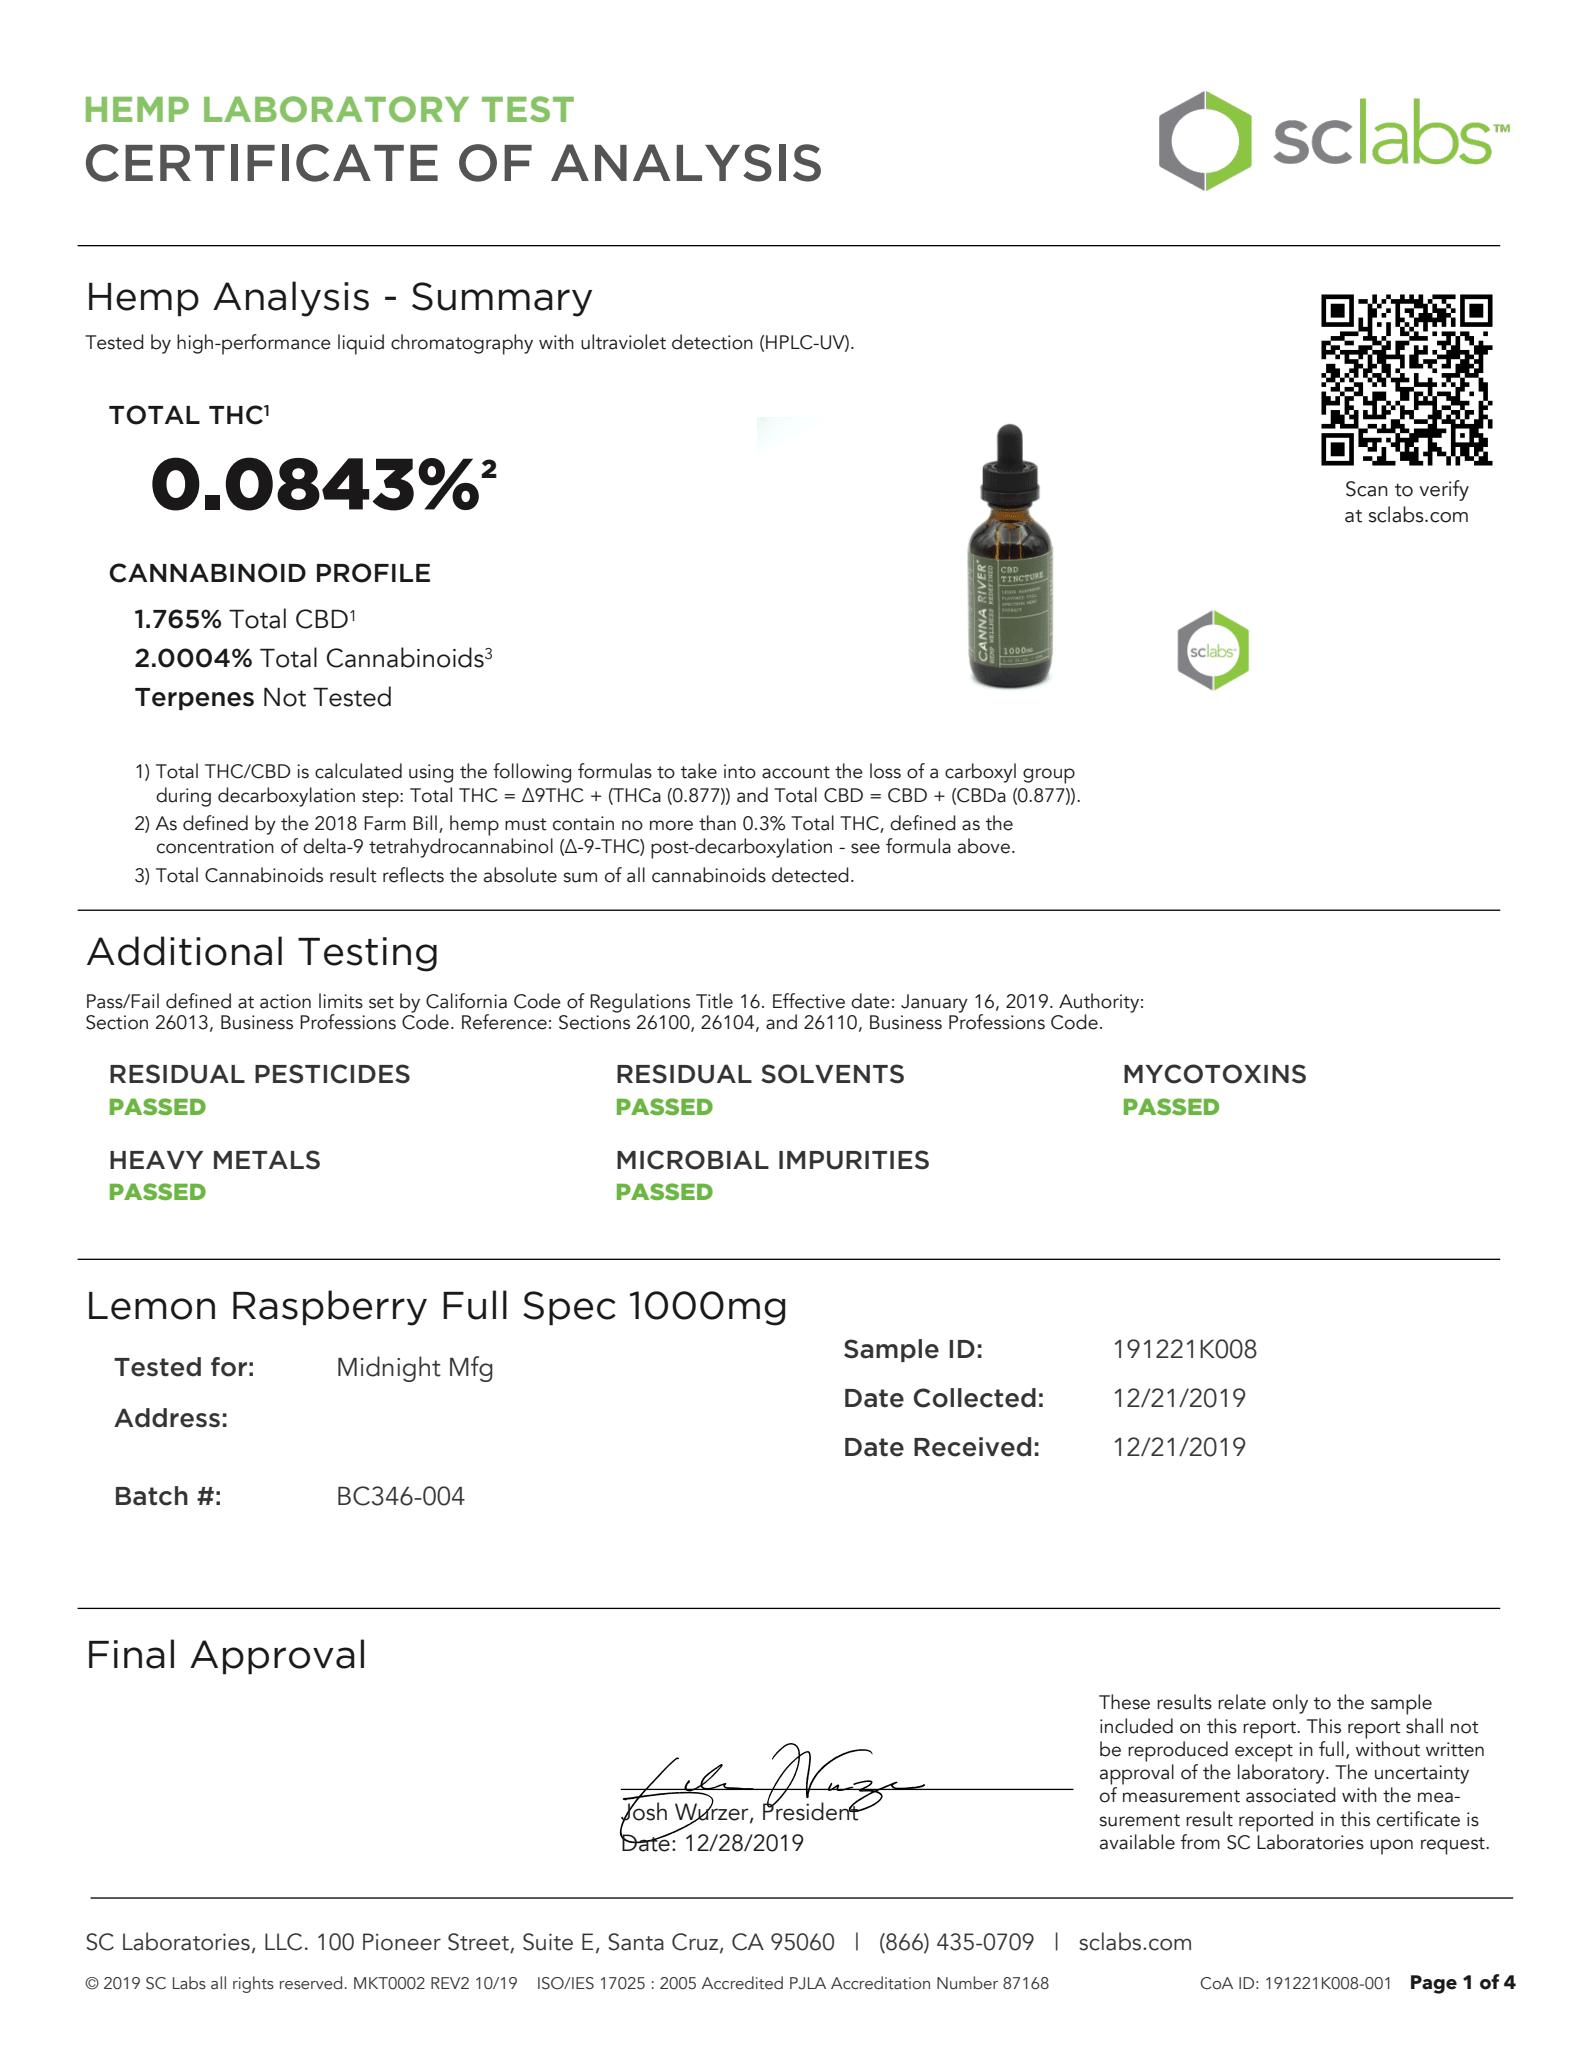 CANNA RIVER CBD Tincture Lab Report Full Spectrum Lemon Raspberry 1000mg